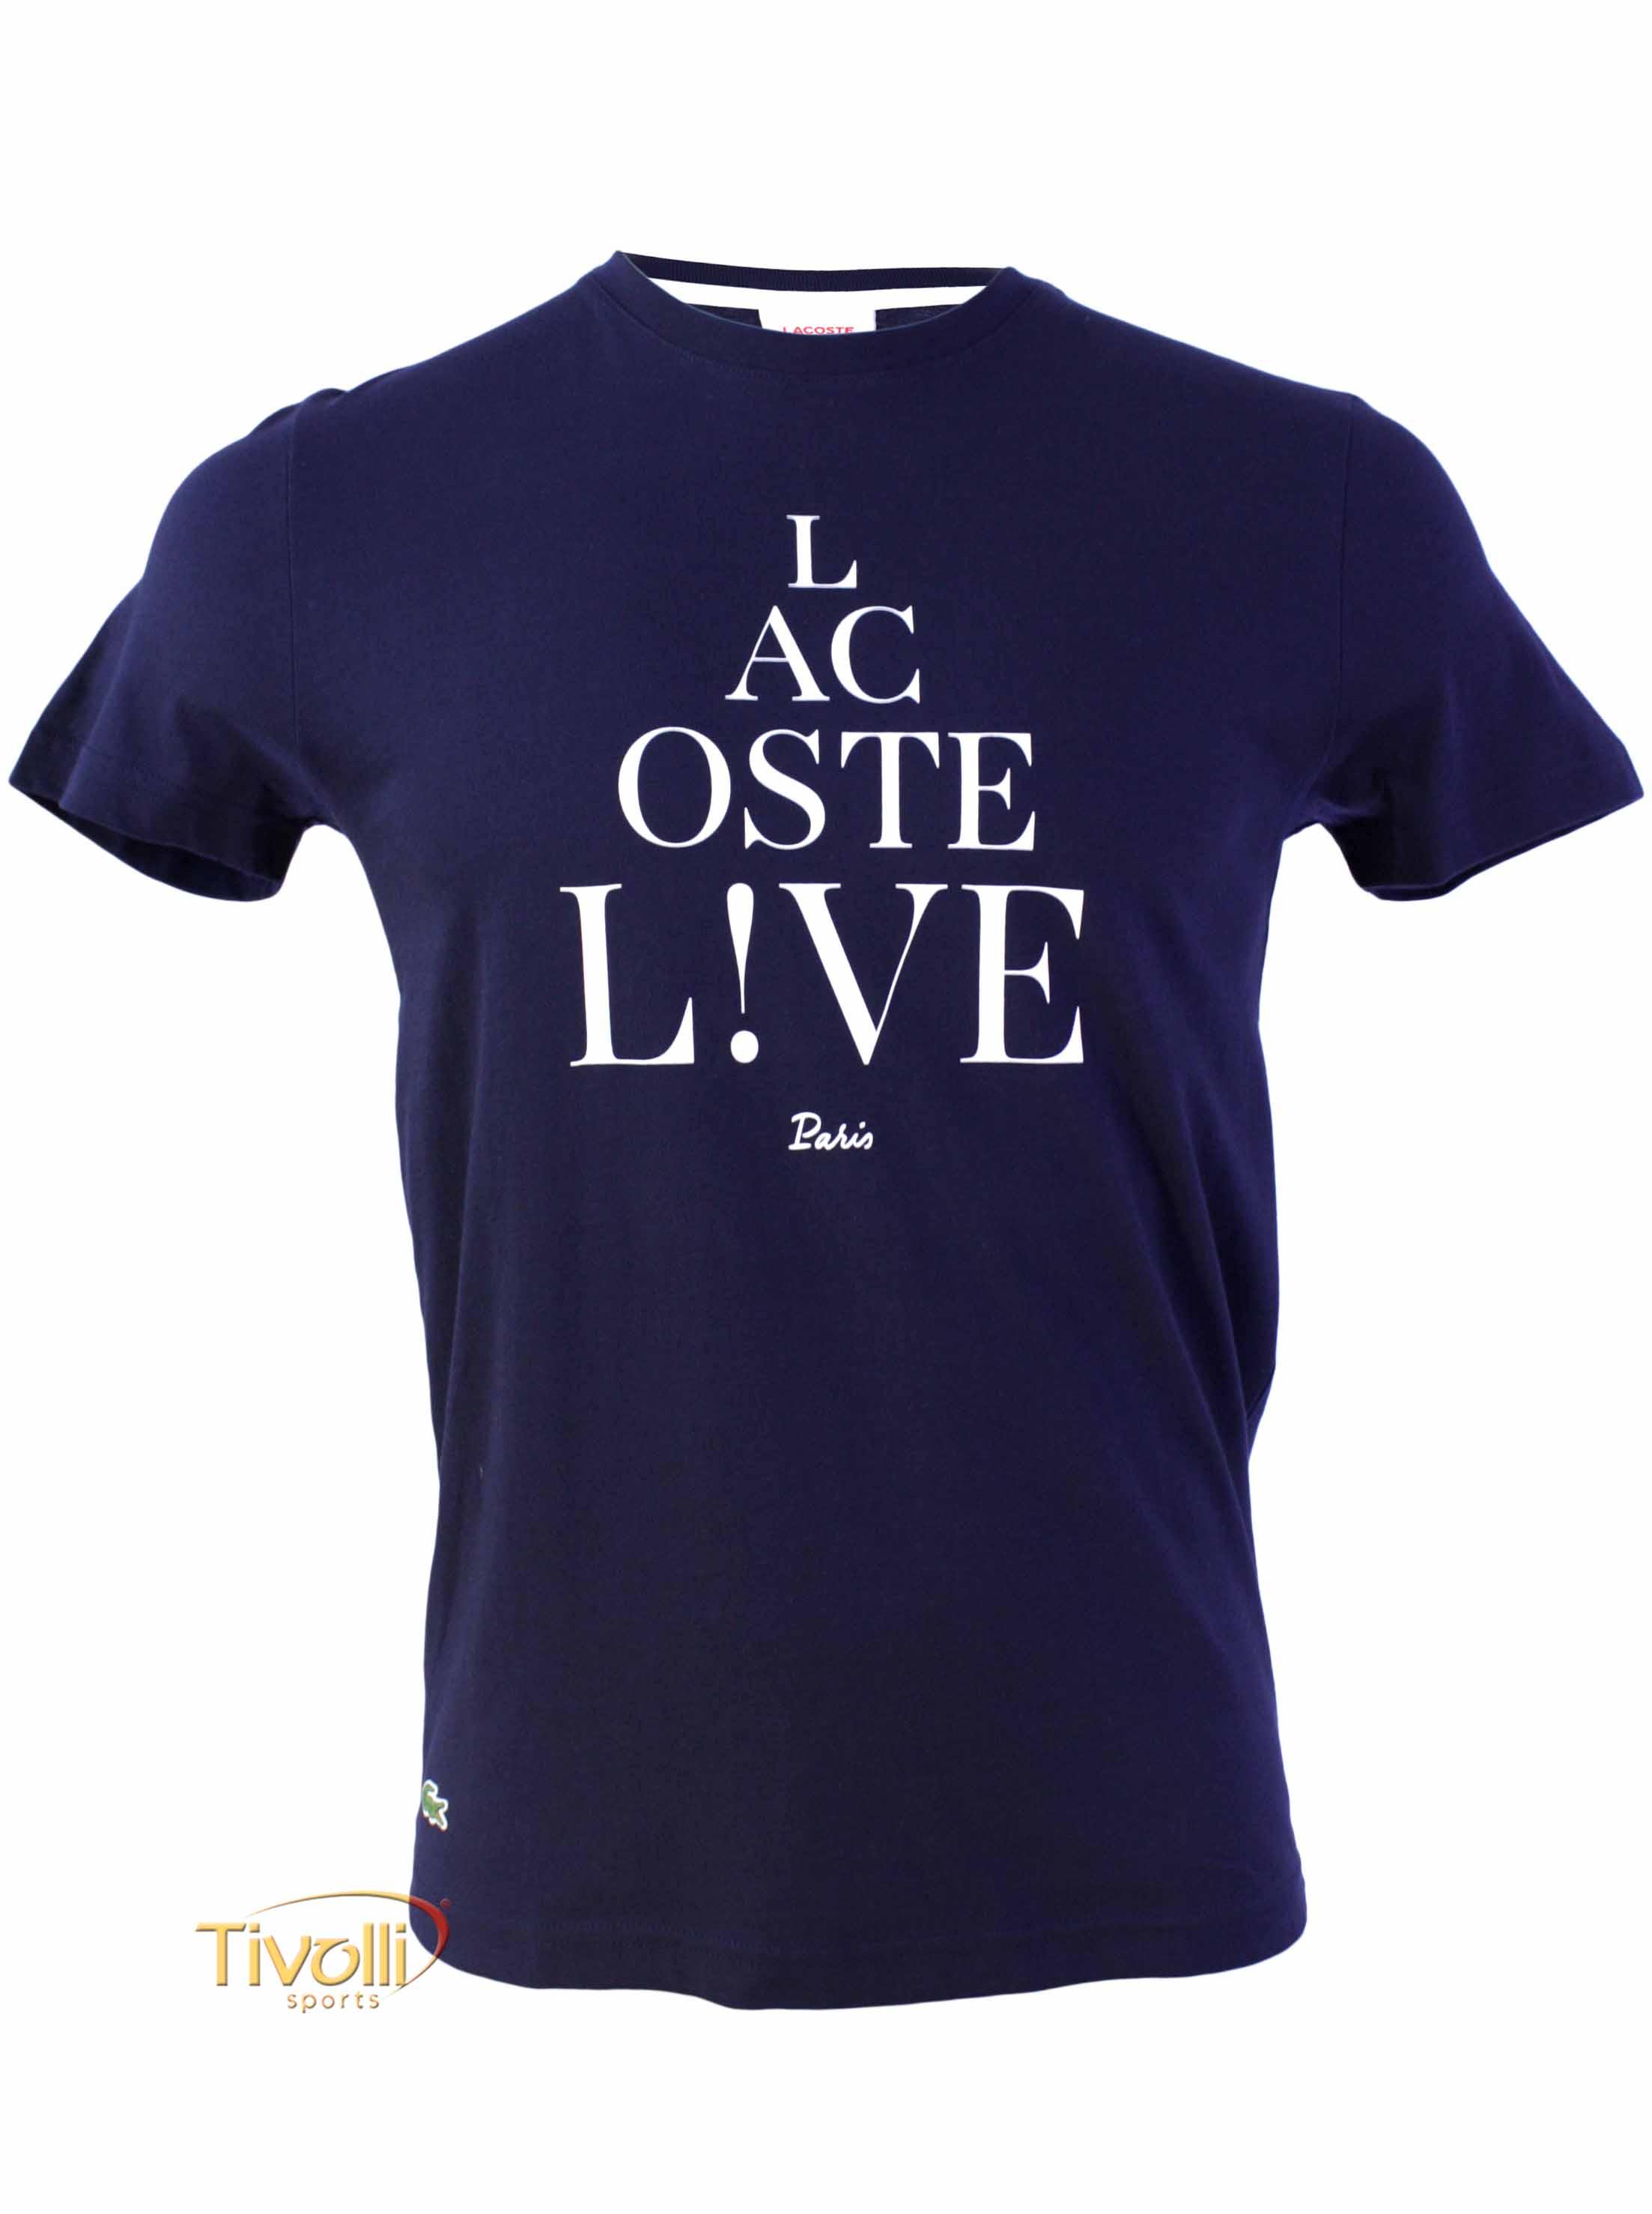 13f7fdc1390bf Camiseta Lacoste Live   Marinho e Branca